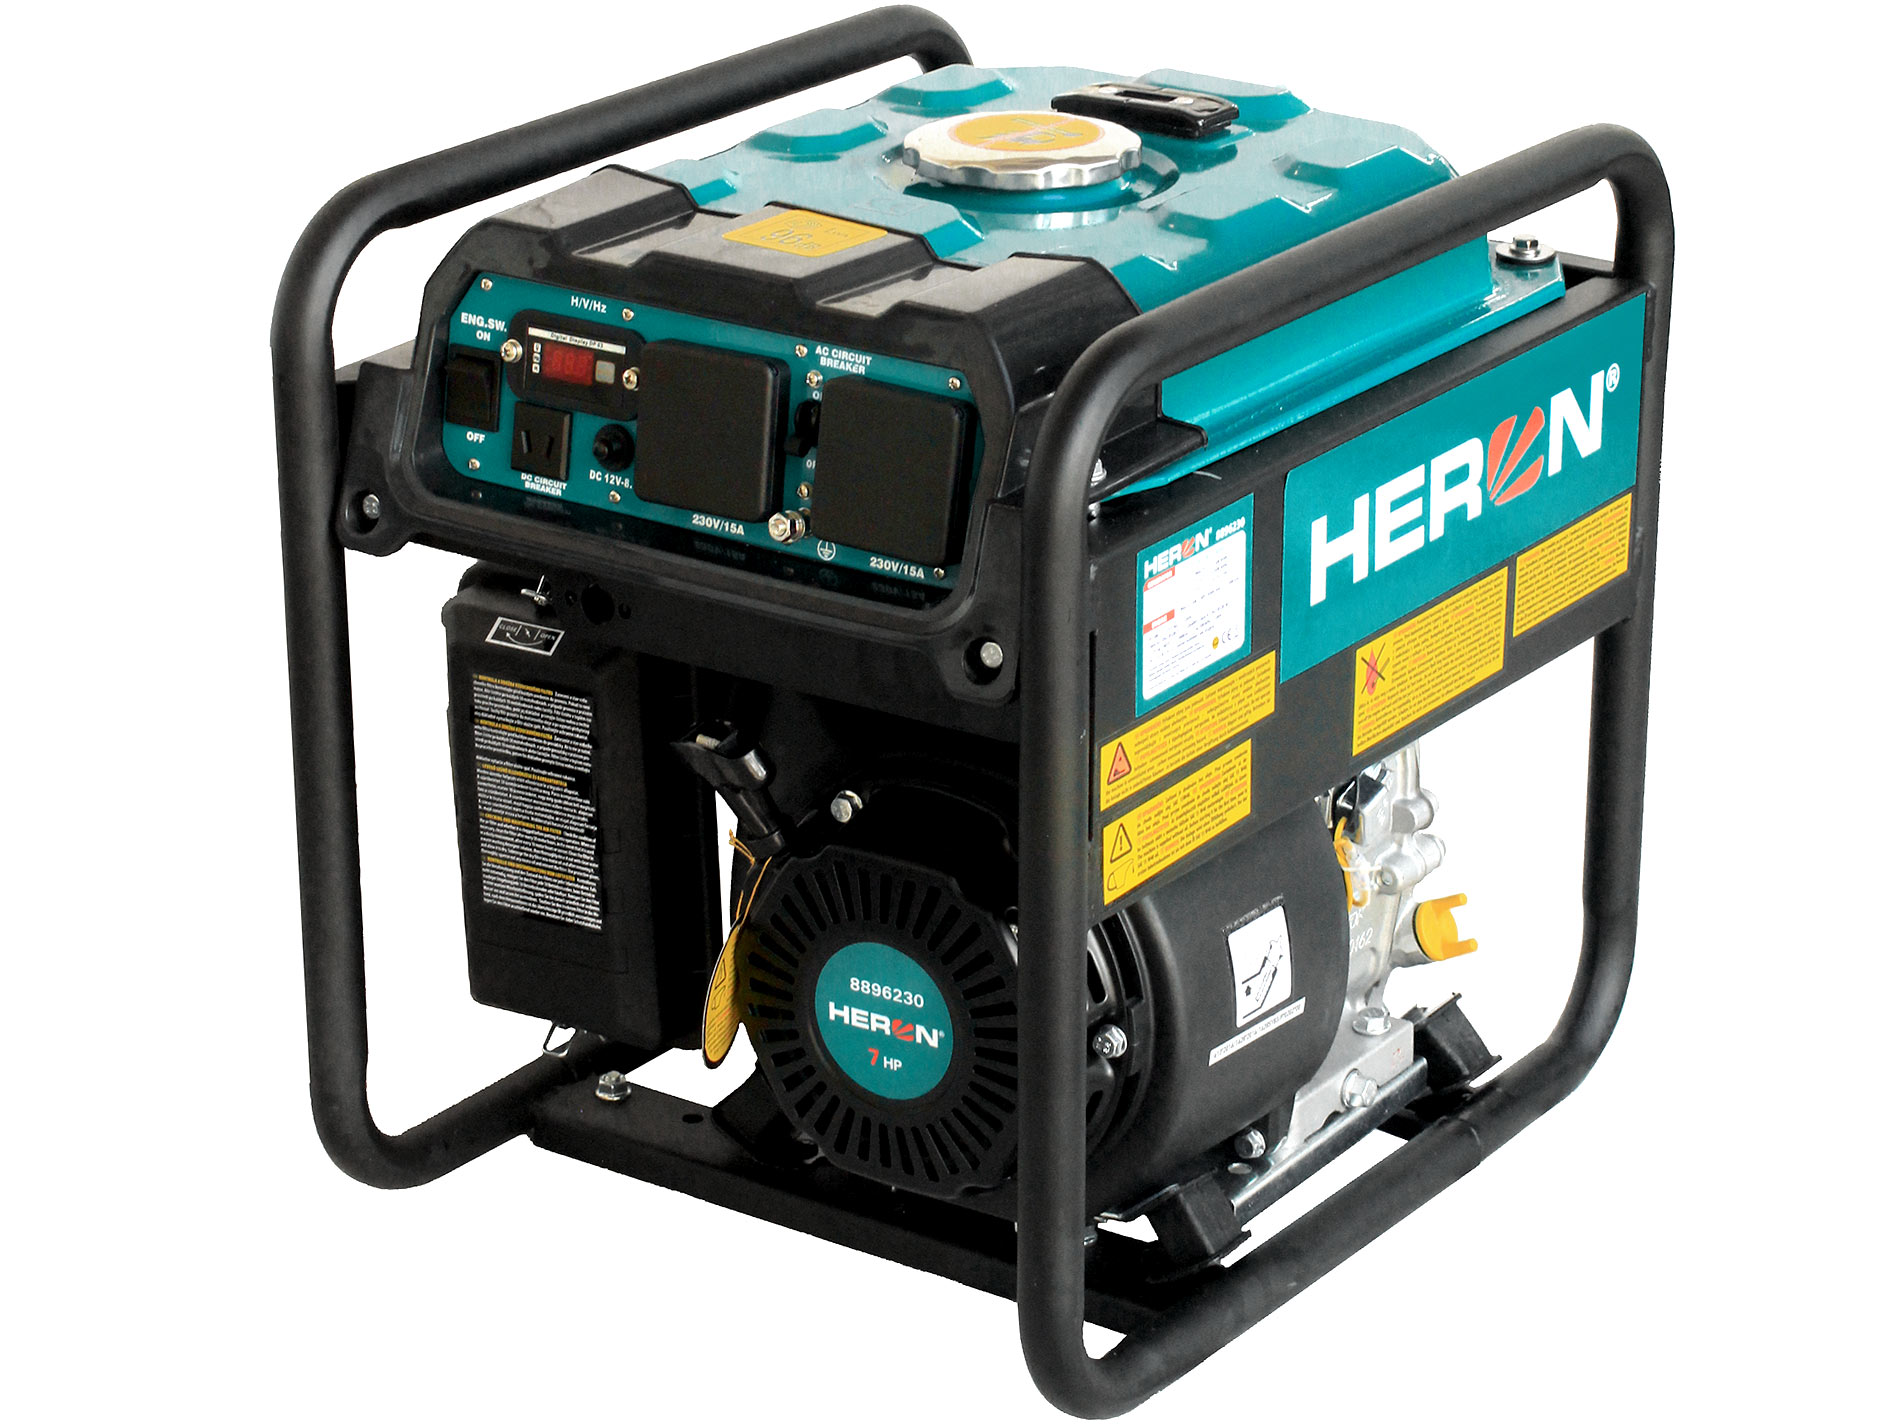 Digital 7hp, 3.7kW Petrol Generator